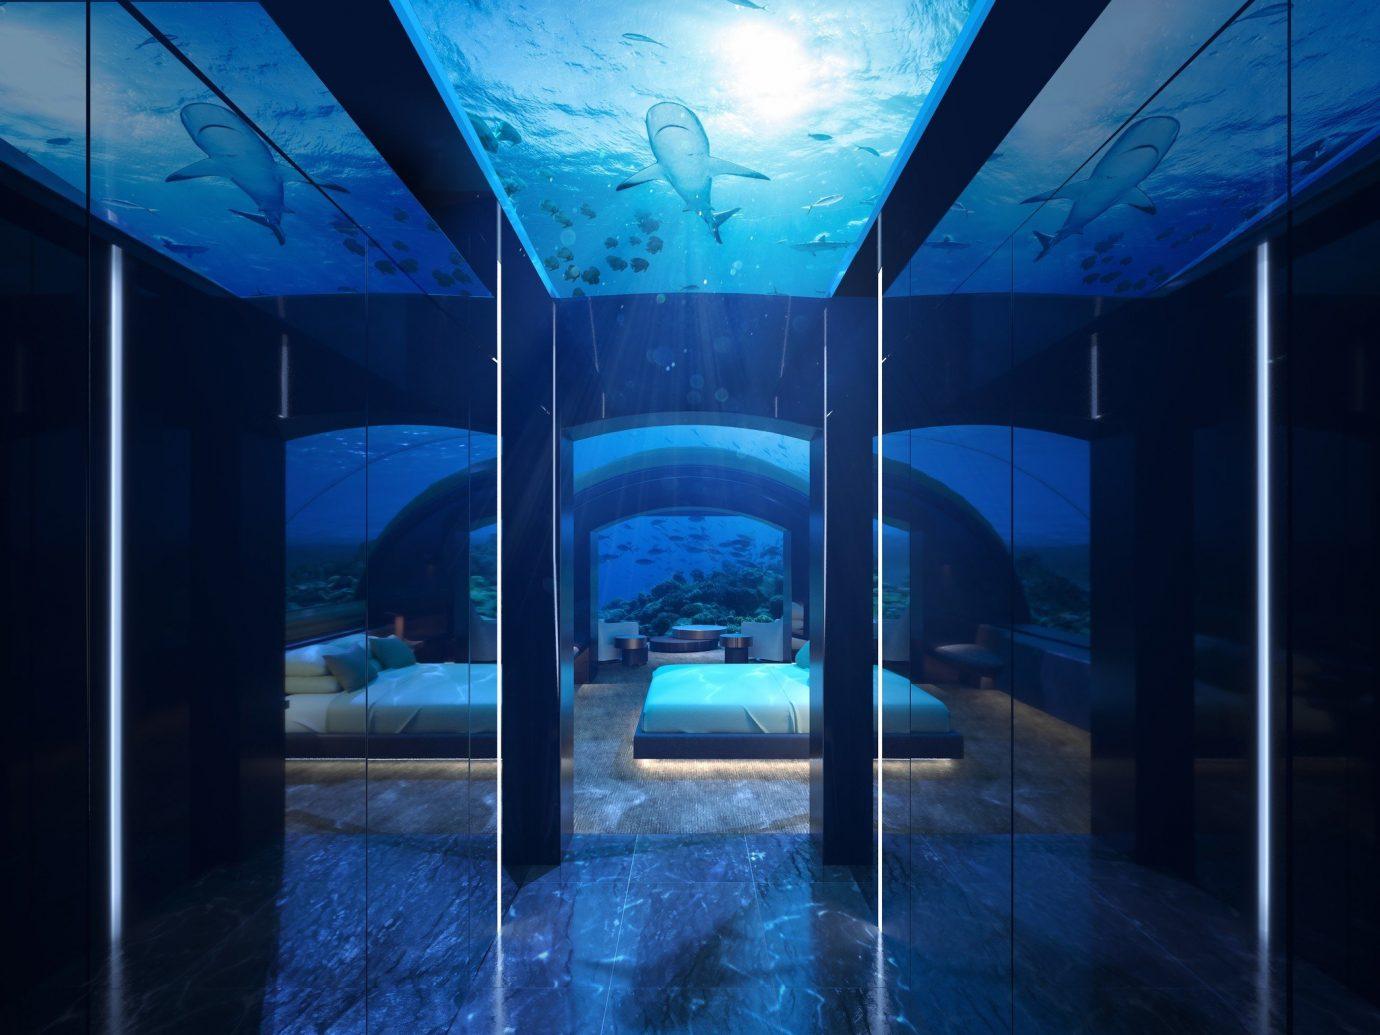 asia Beach Hotels Islands Maldives News blue light Architecture lighting darkness interior design computer wallpaper glass